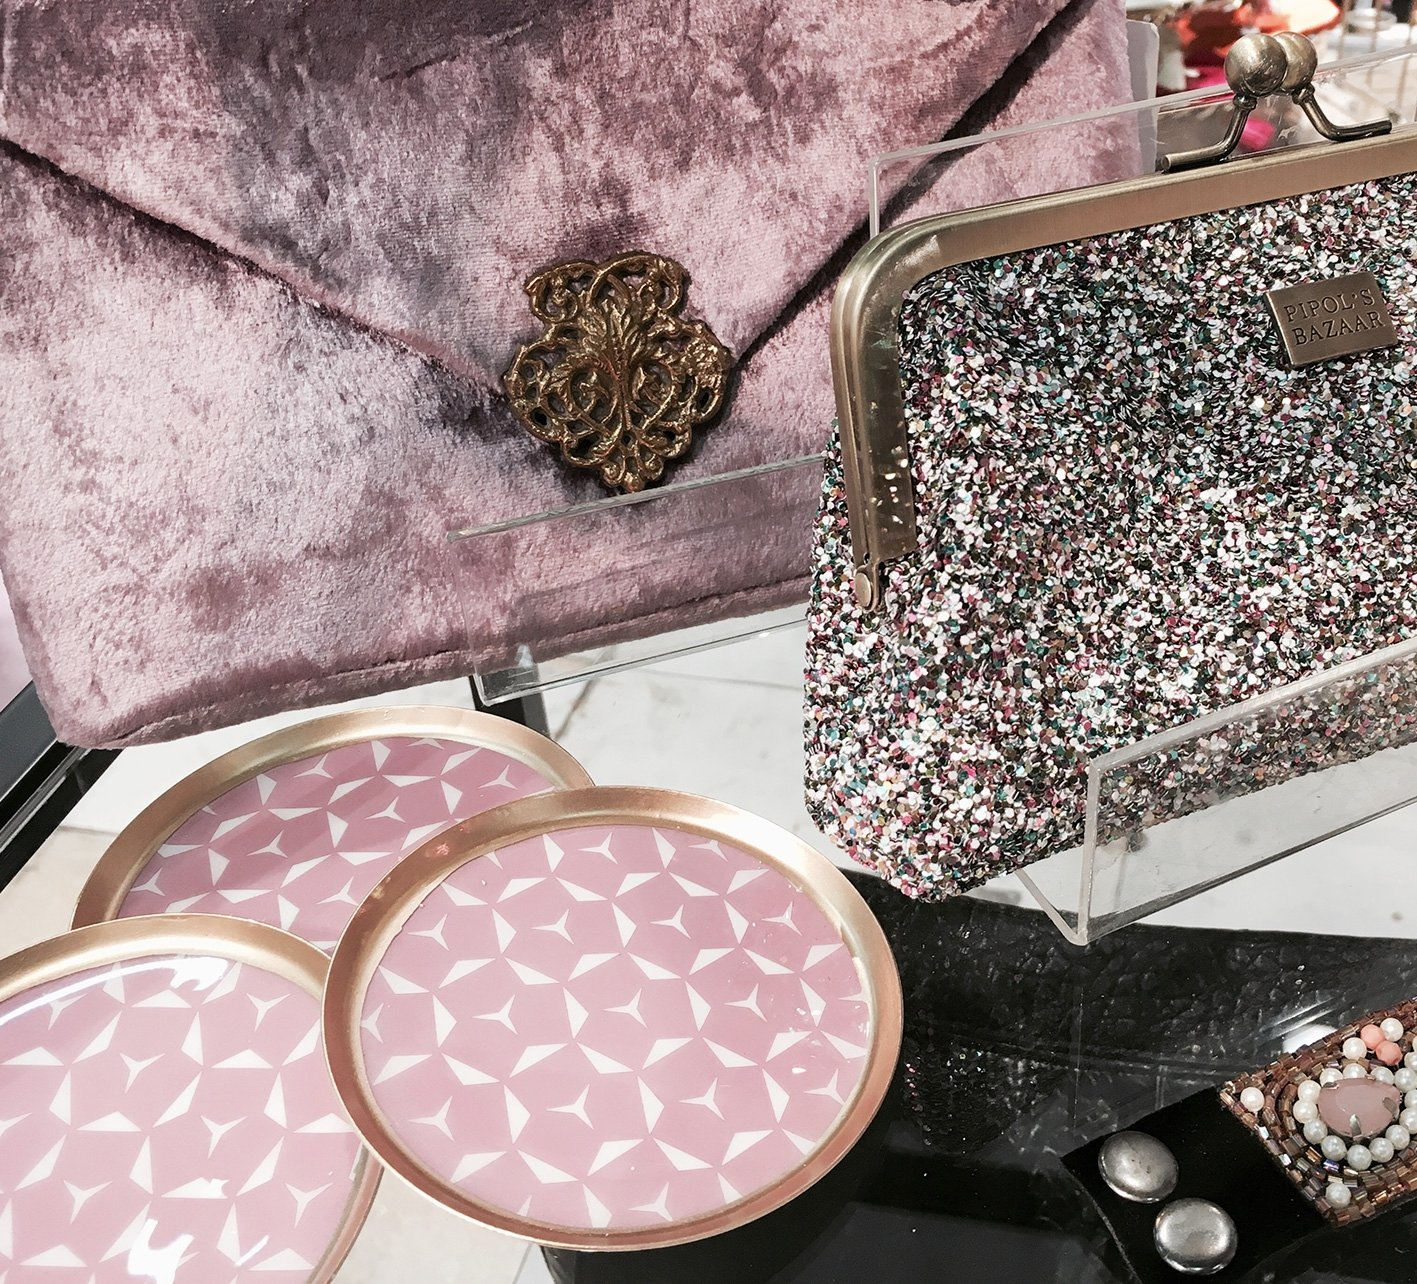 Glasunderlägg  Ethno  Pink  6-Pack